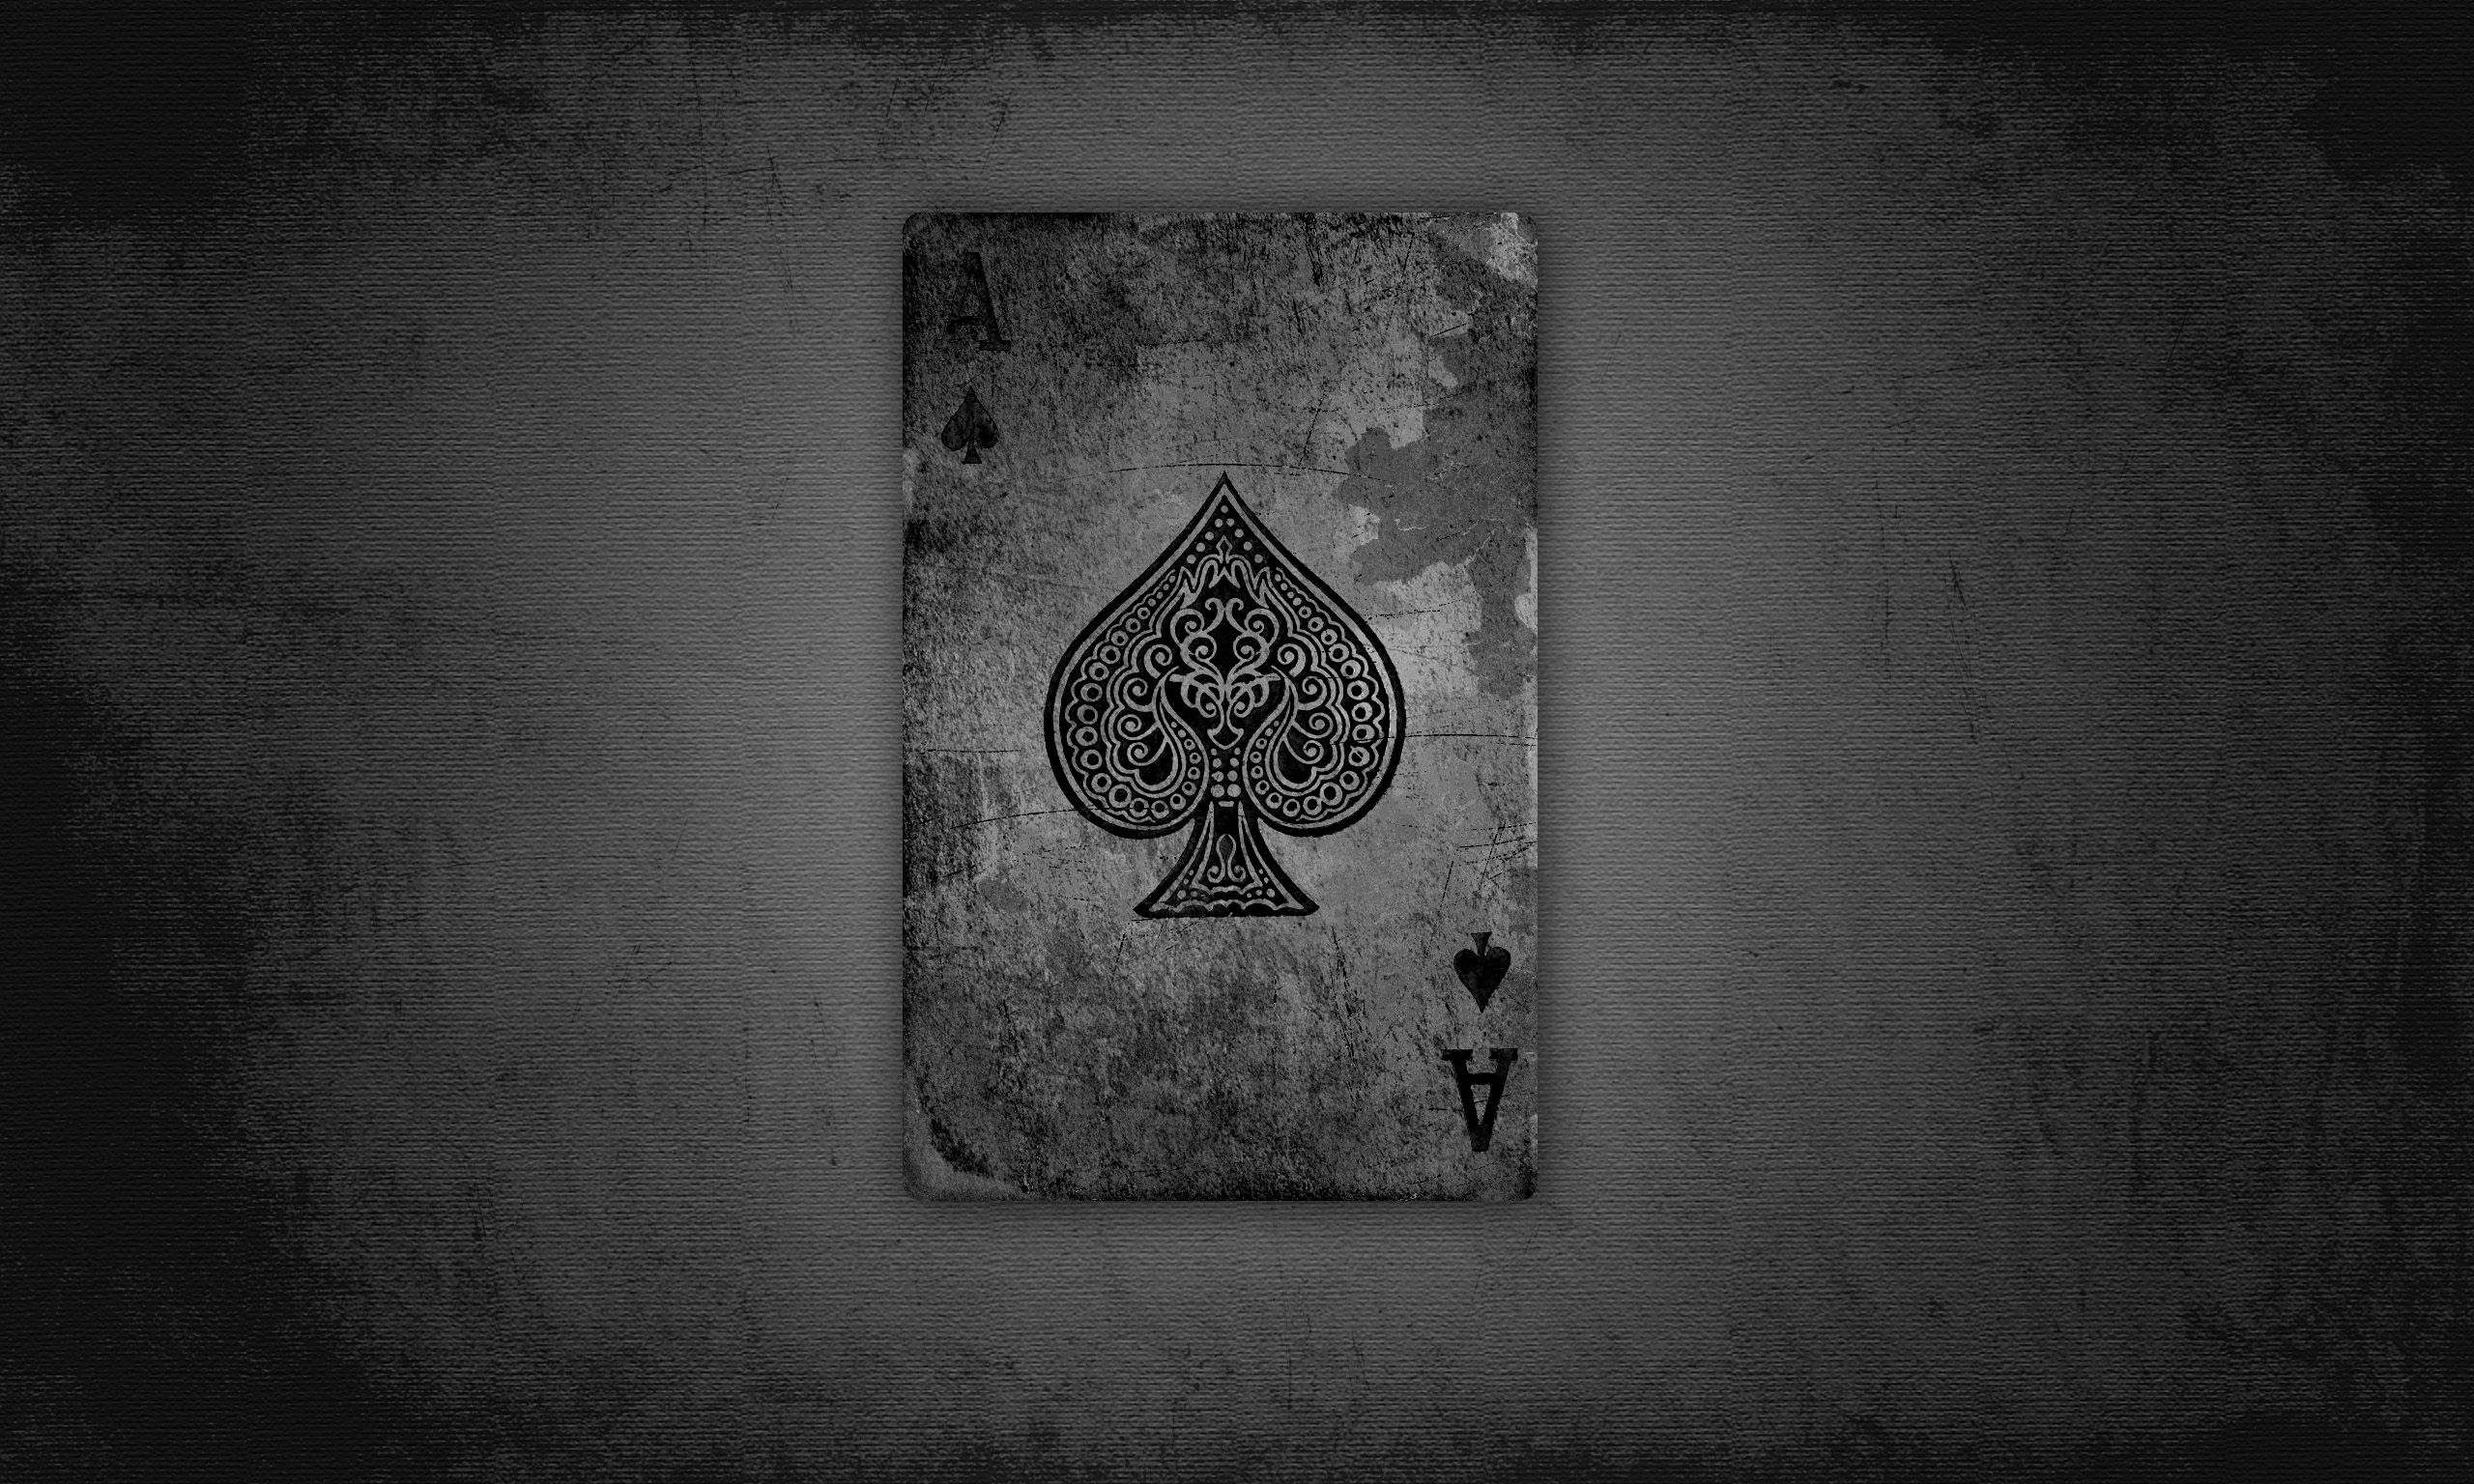 Ace of spades wallpaper wallpapersafari - Cool card wallpapers ...